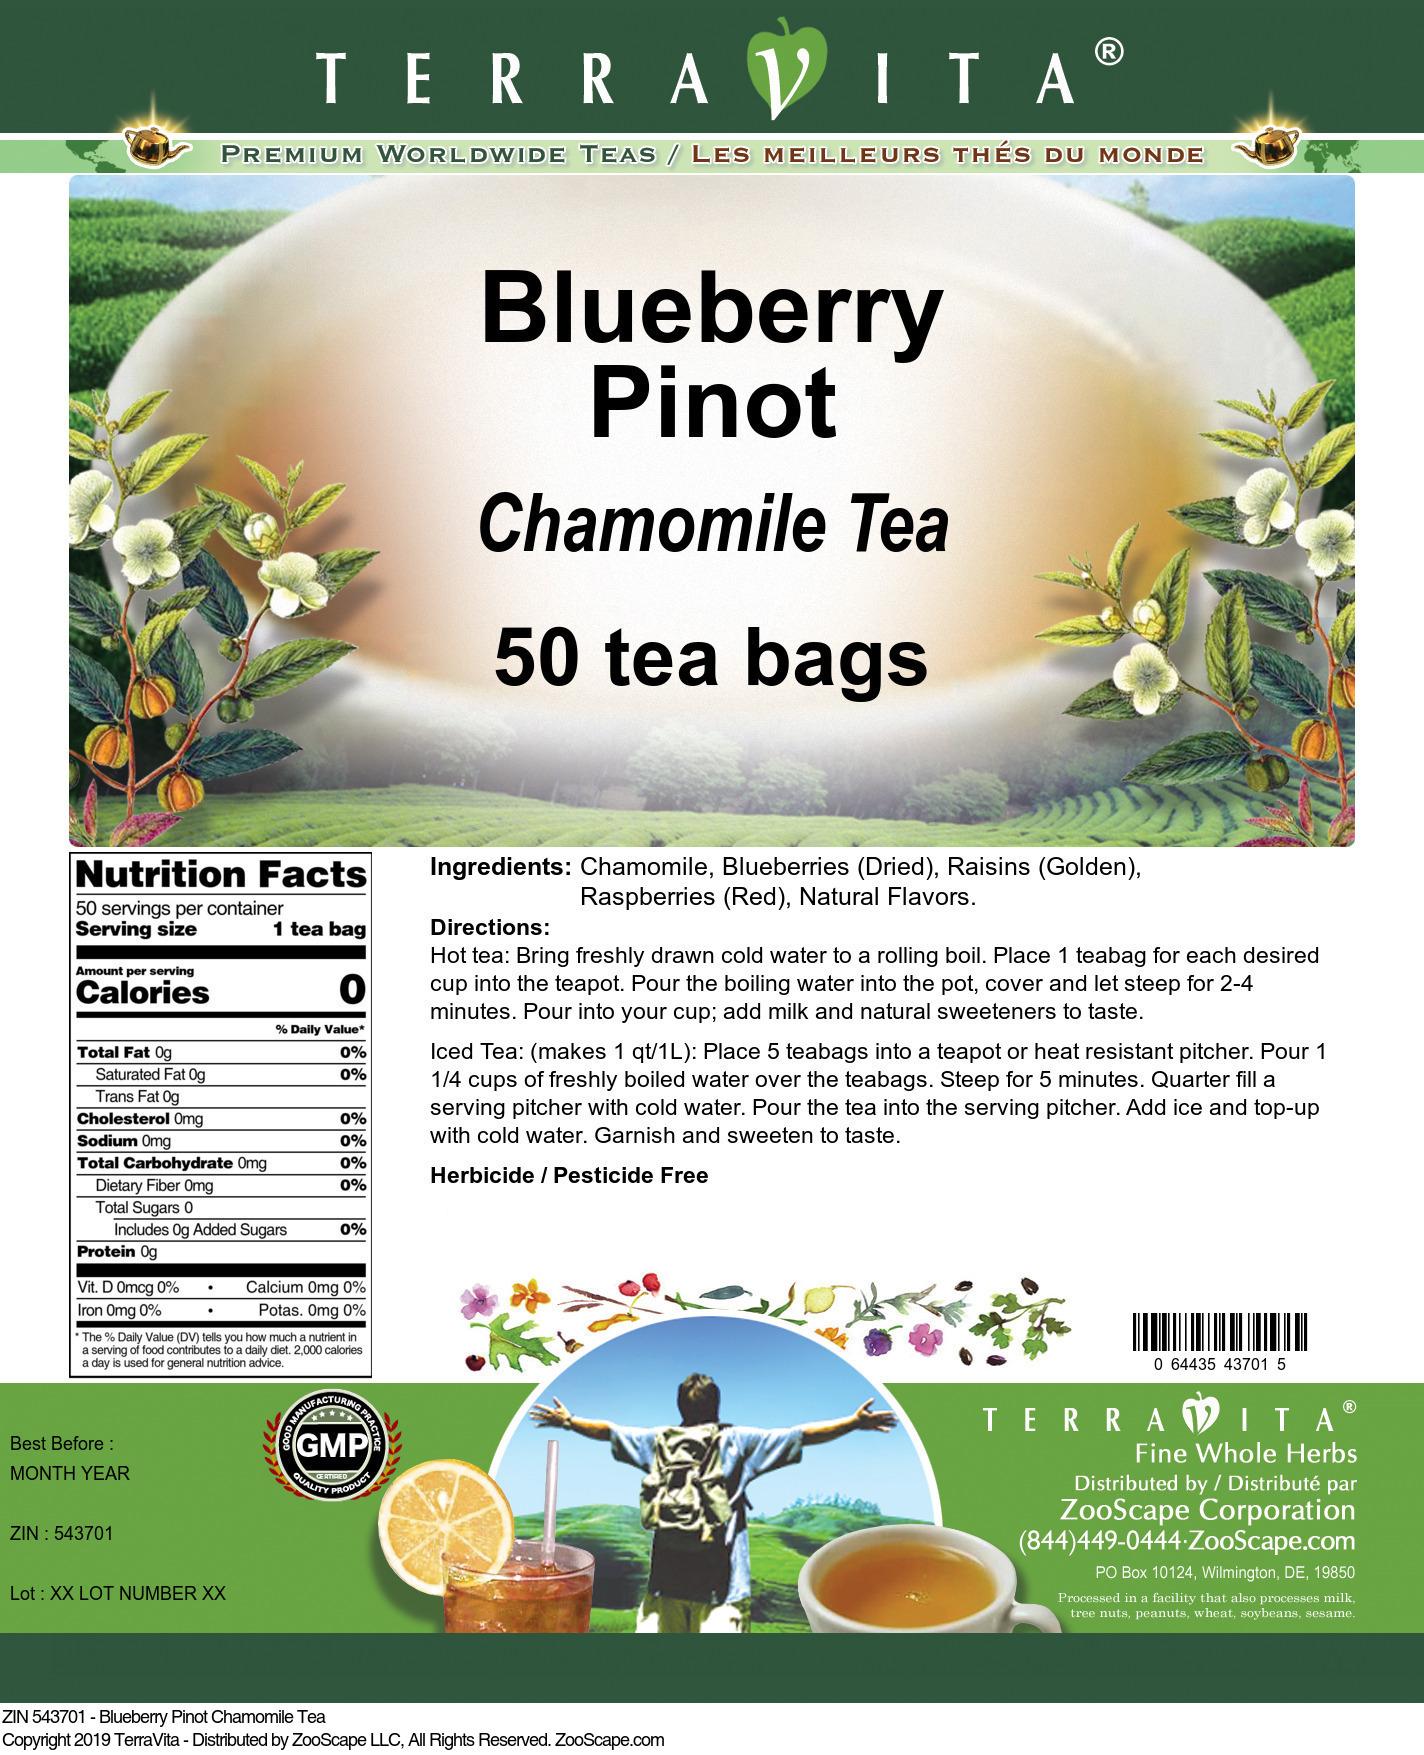 Blueberry Pinot Chamomile Tea